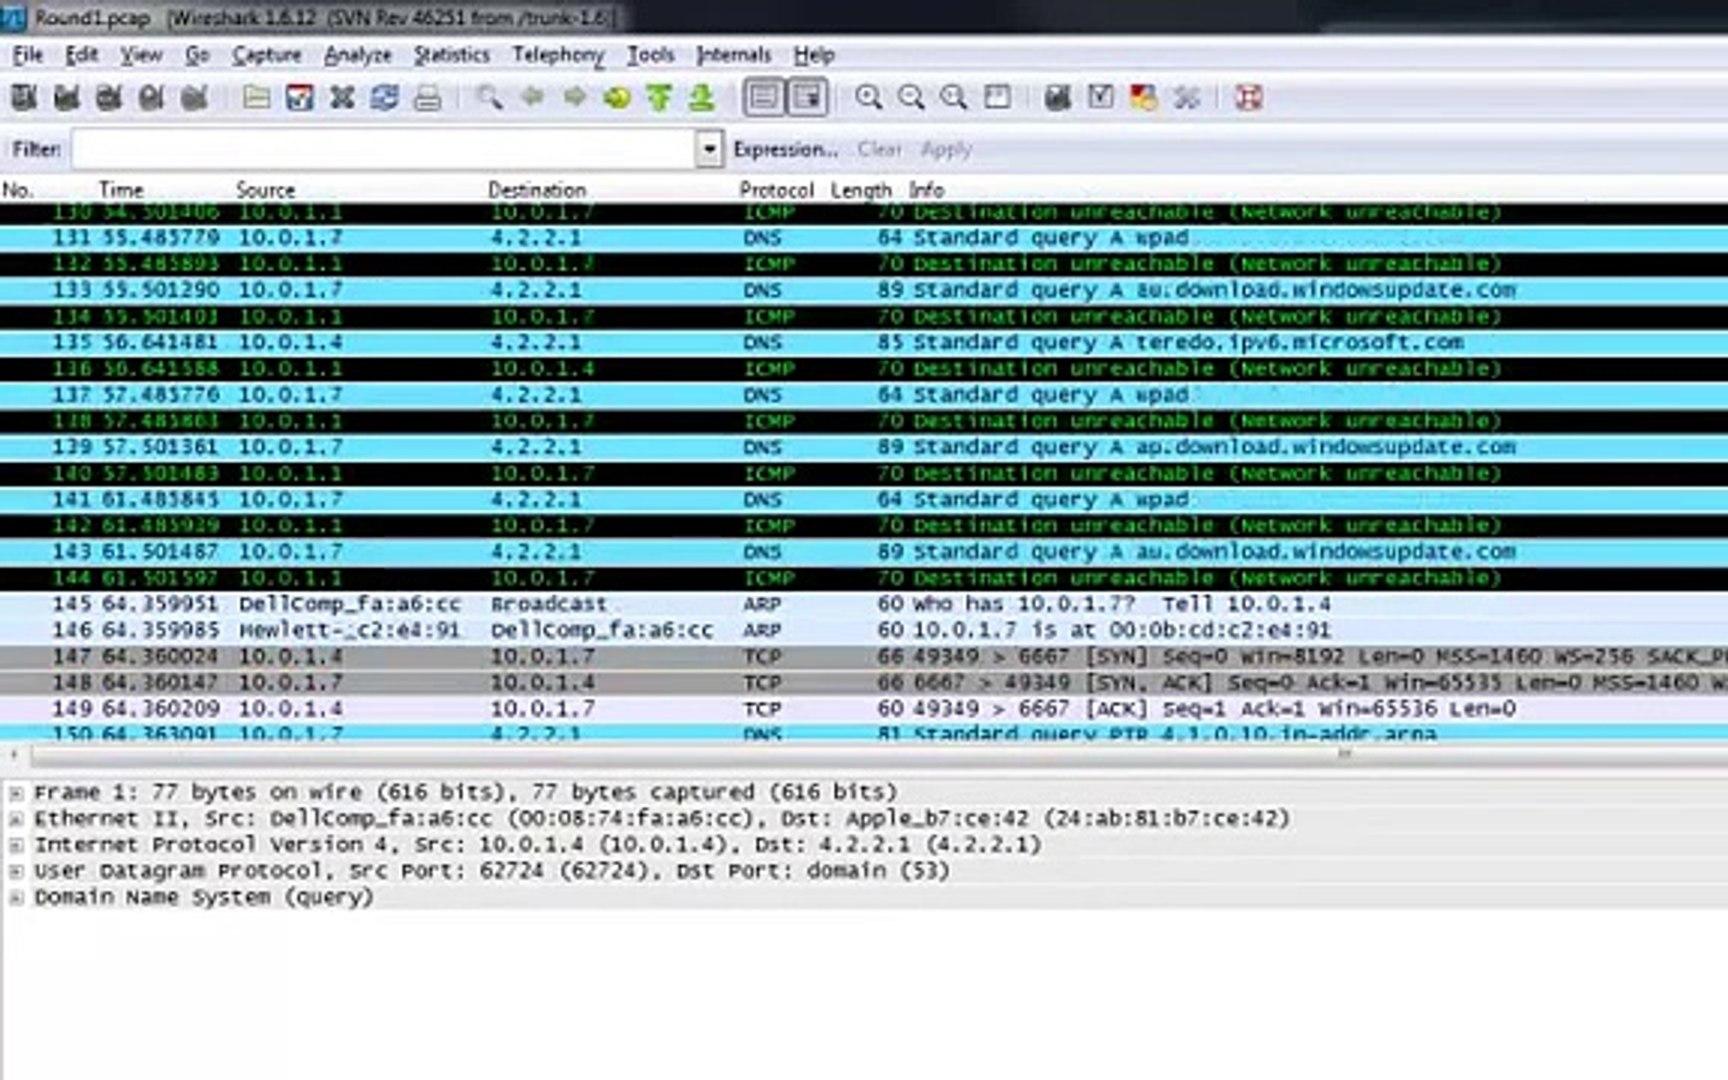 Cyber Hui Forensics Training - Lab 3: Network Forensics/PCAP Analysis